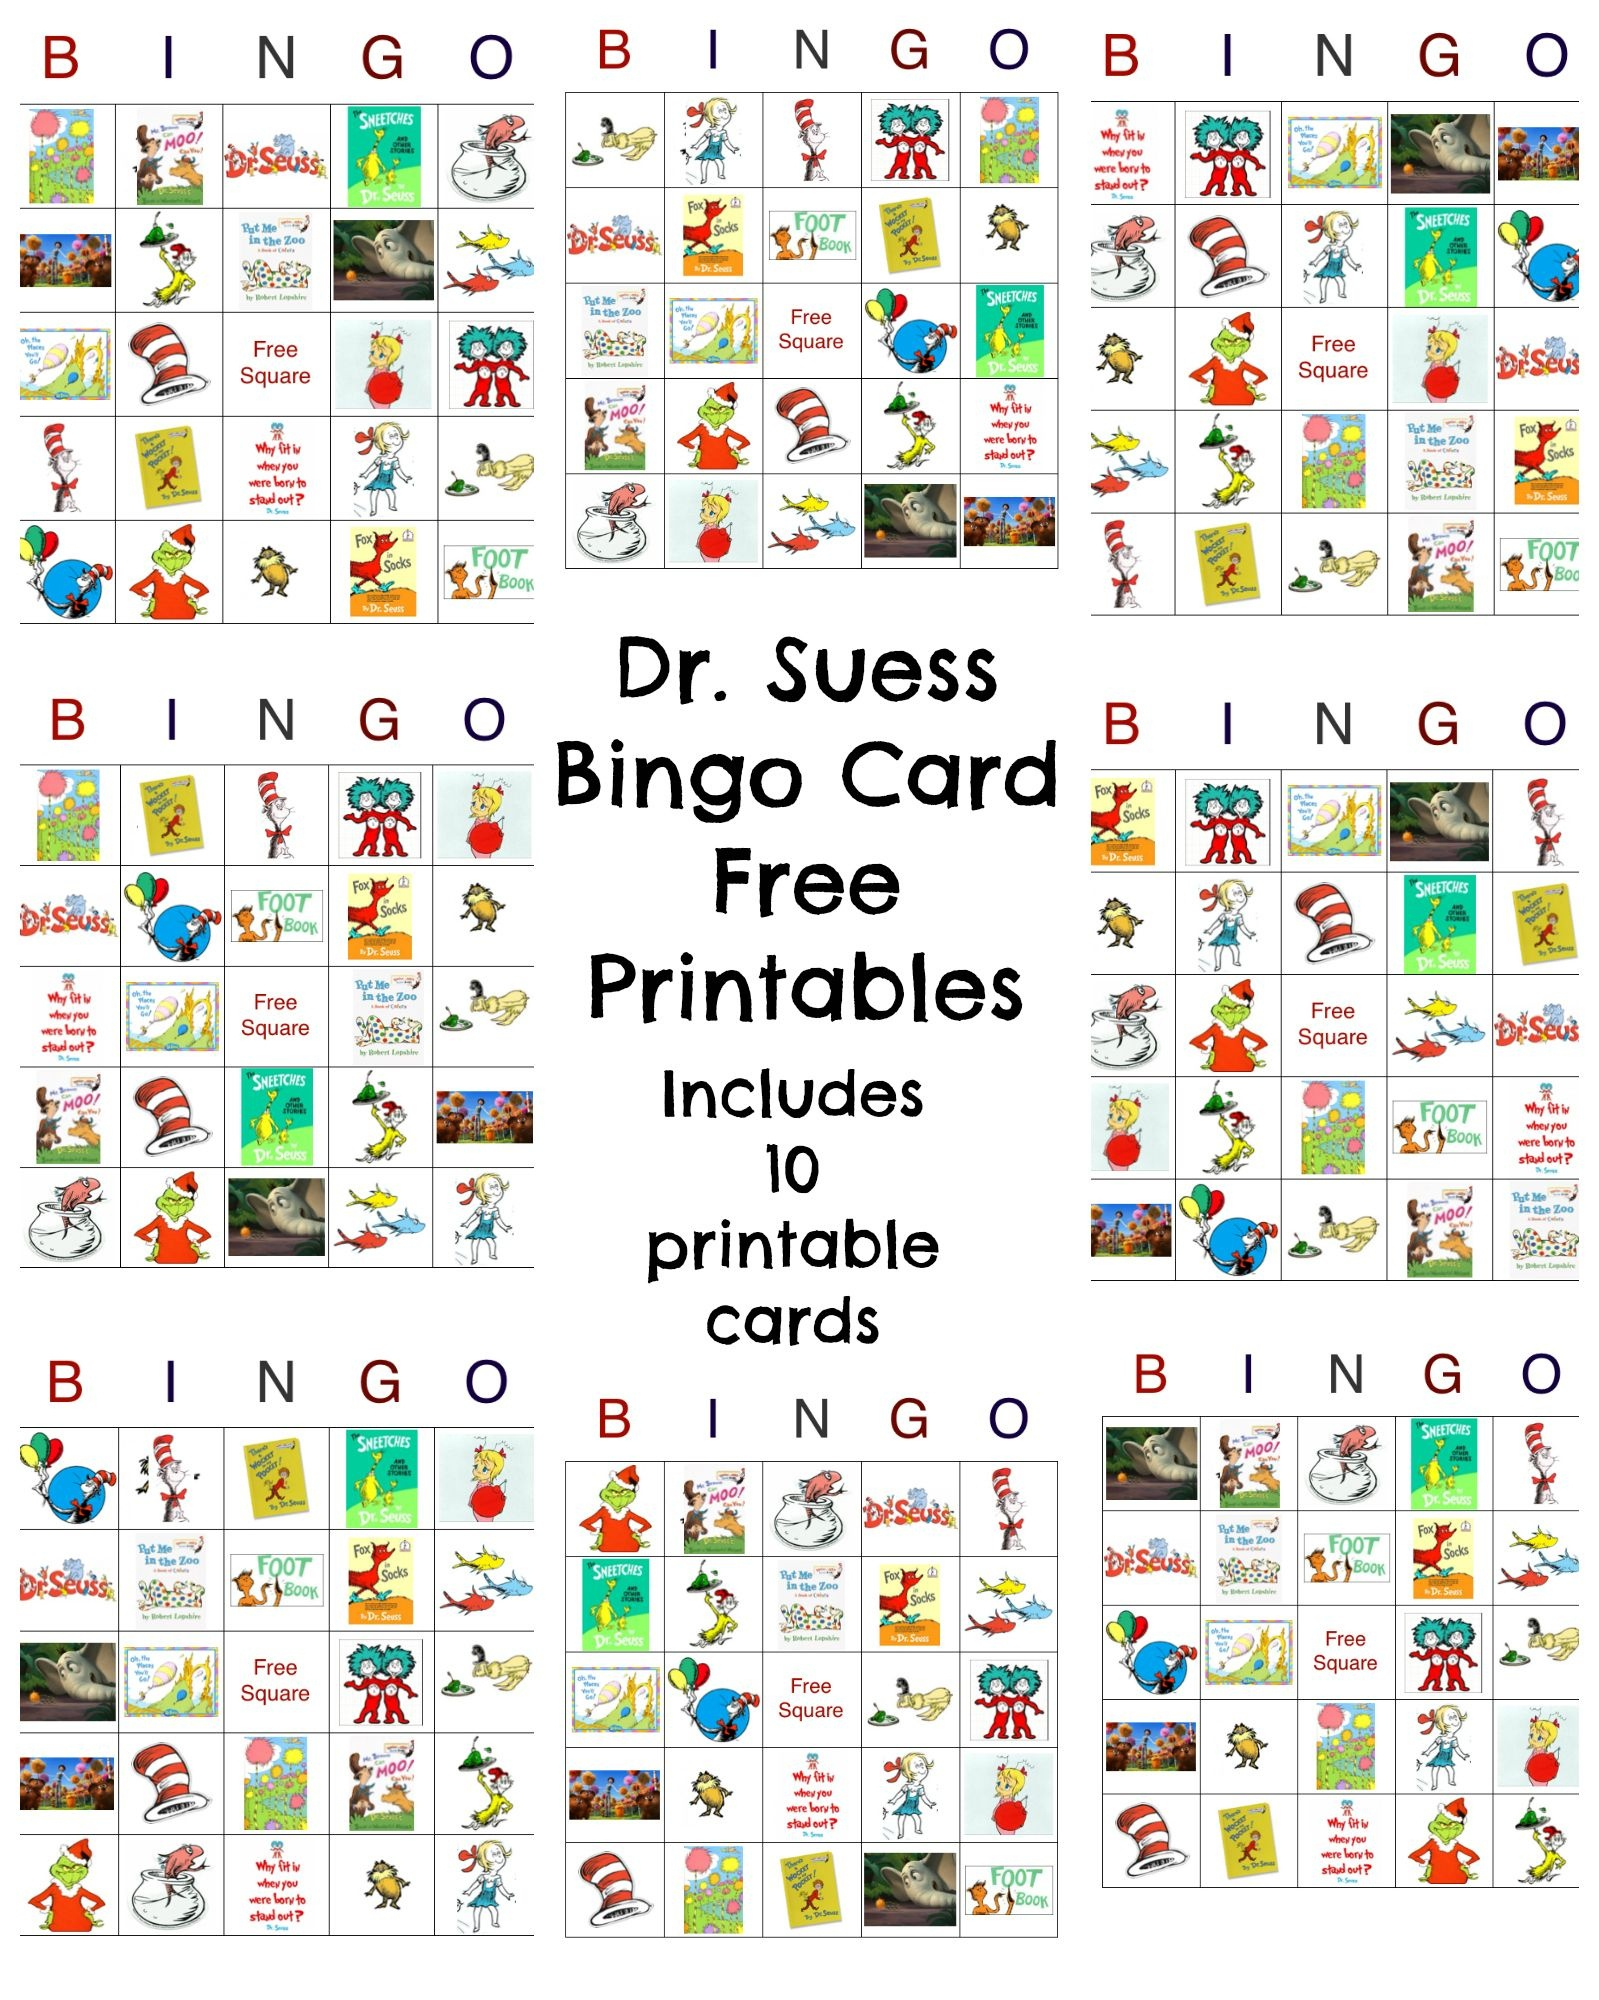 Dr Seuss Bingo Game Free Printable   Best Crafts And Diy   Dr Seuss - Free Printable Dr Who Birthday Card